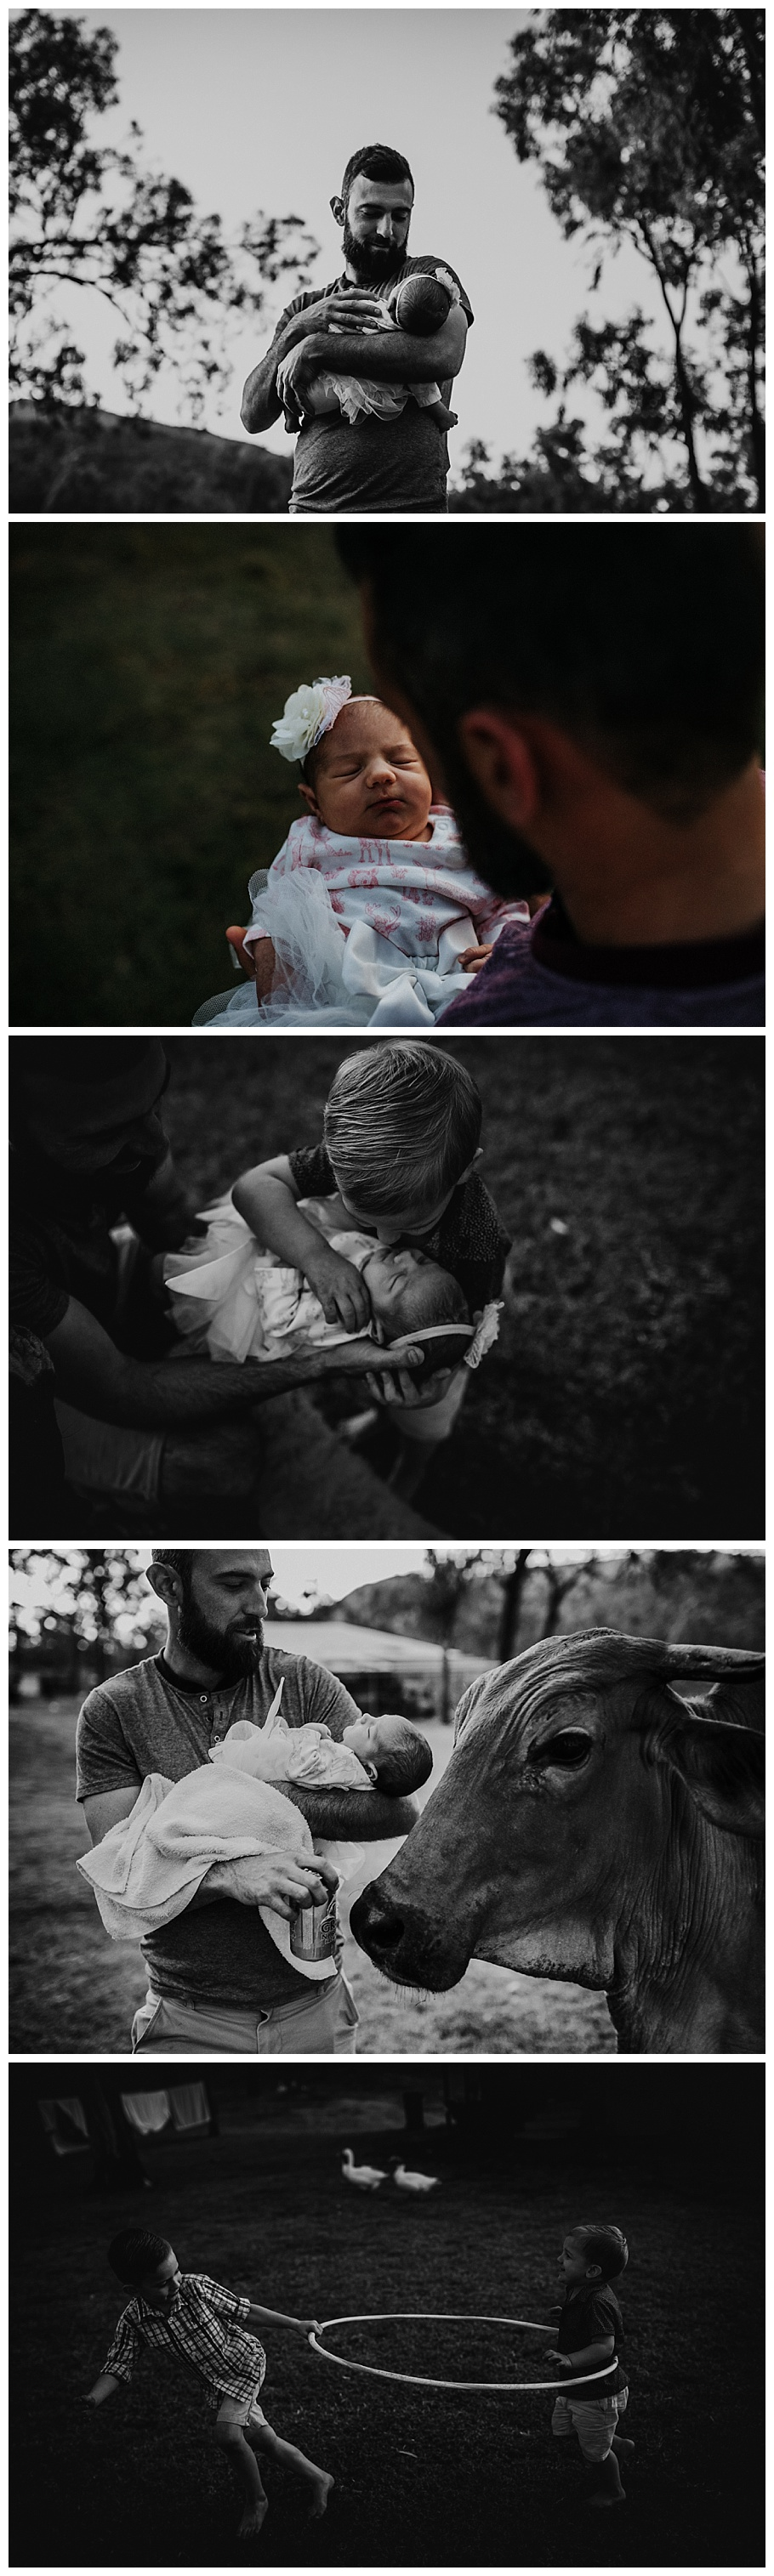 townsville-region-in-home-newborn-baby-lifestyle-photographer-fatherhood.jpg